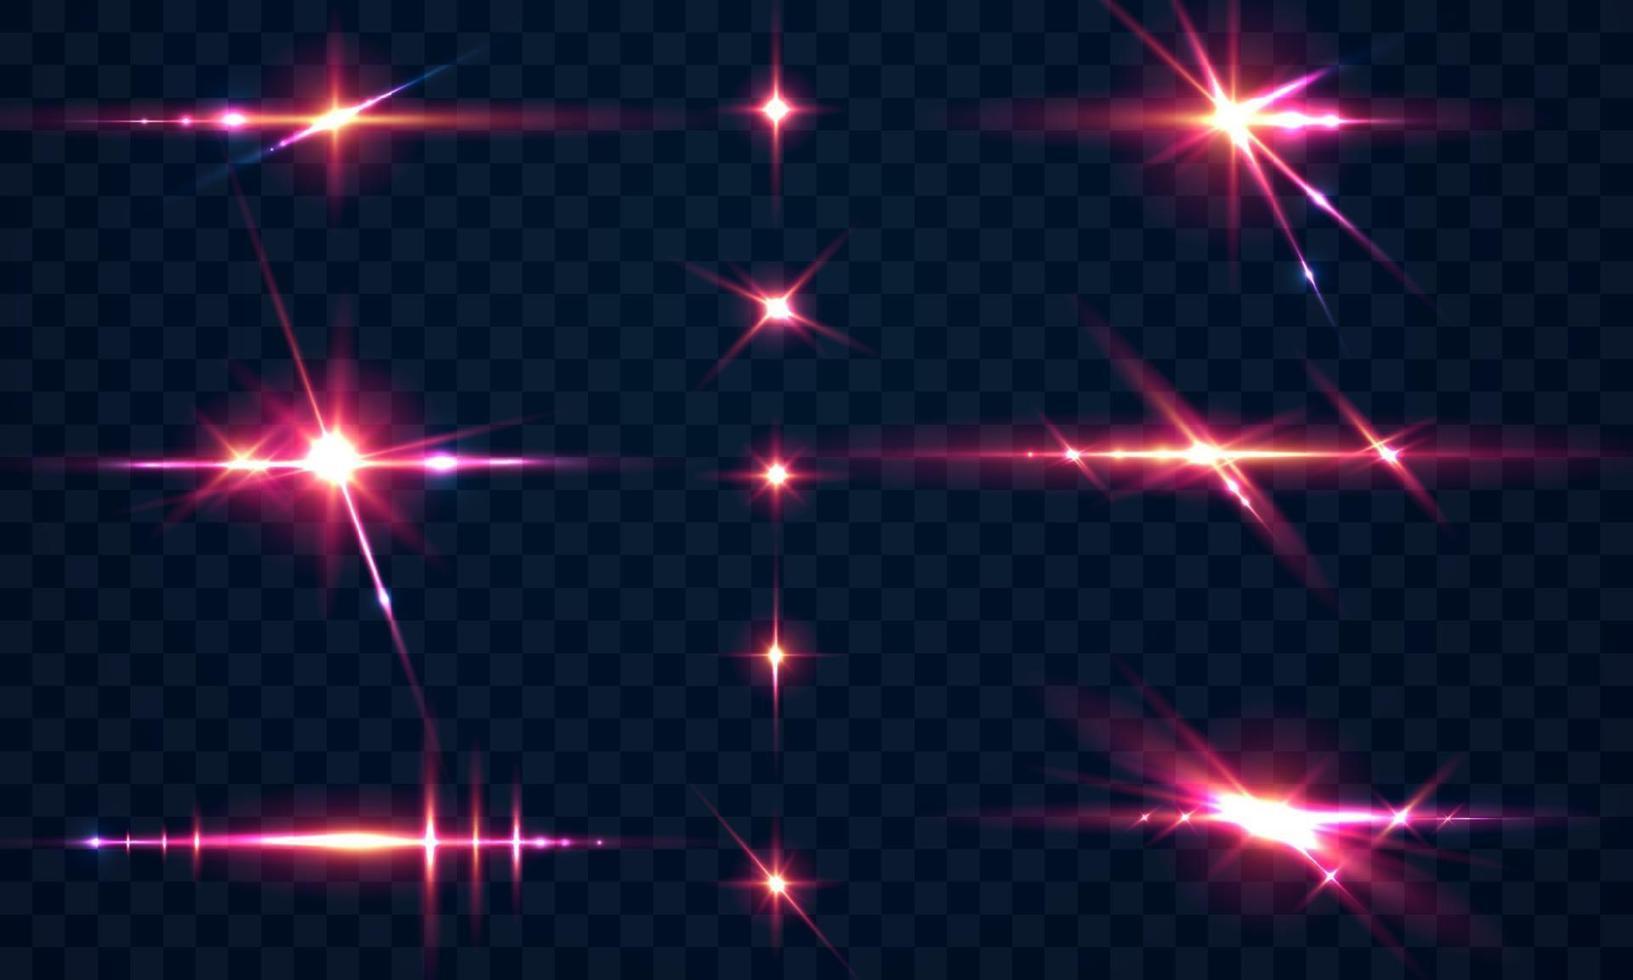 ange gnistor glitter speciell ljuseffekt glödande vektor